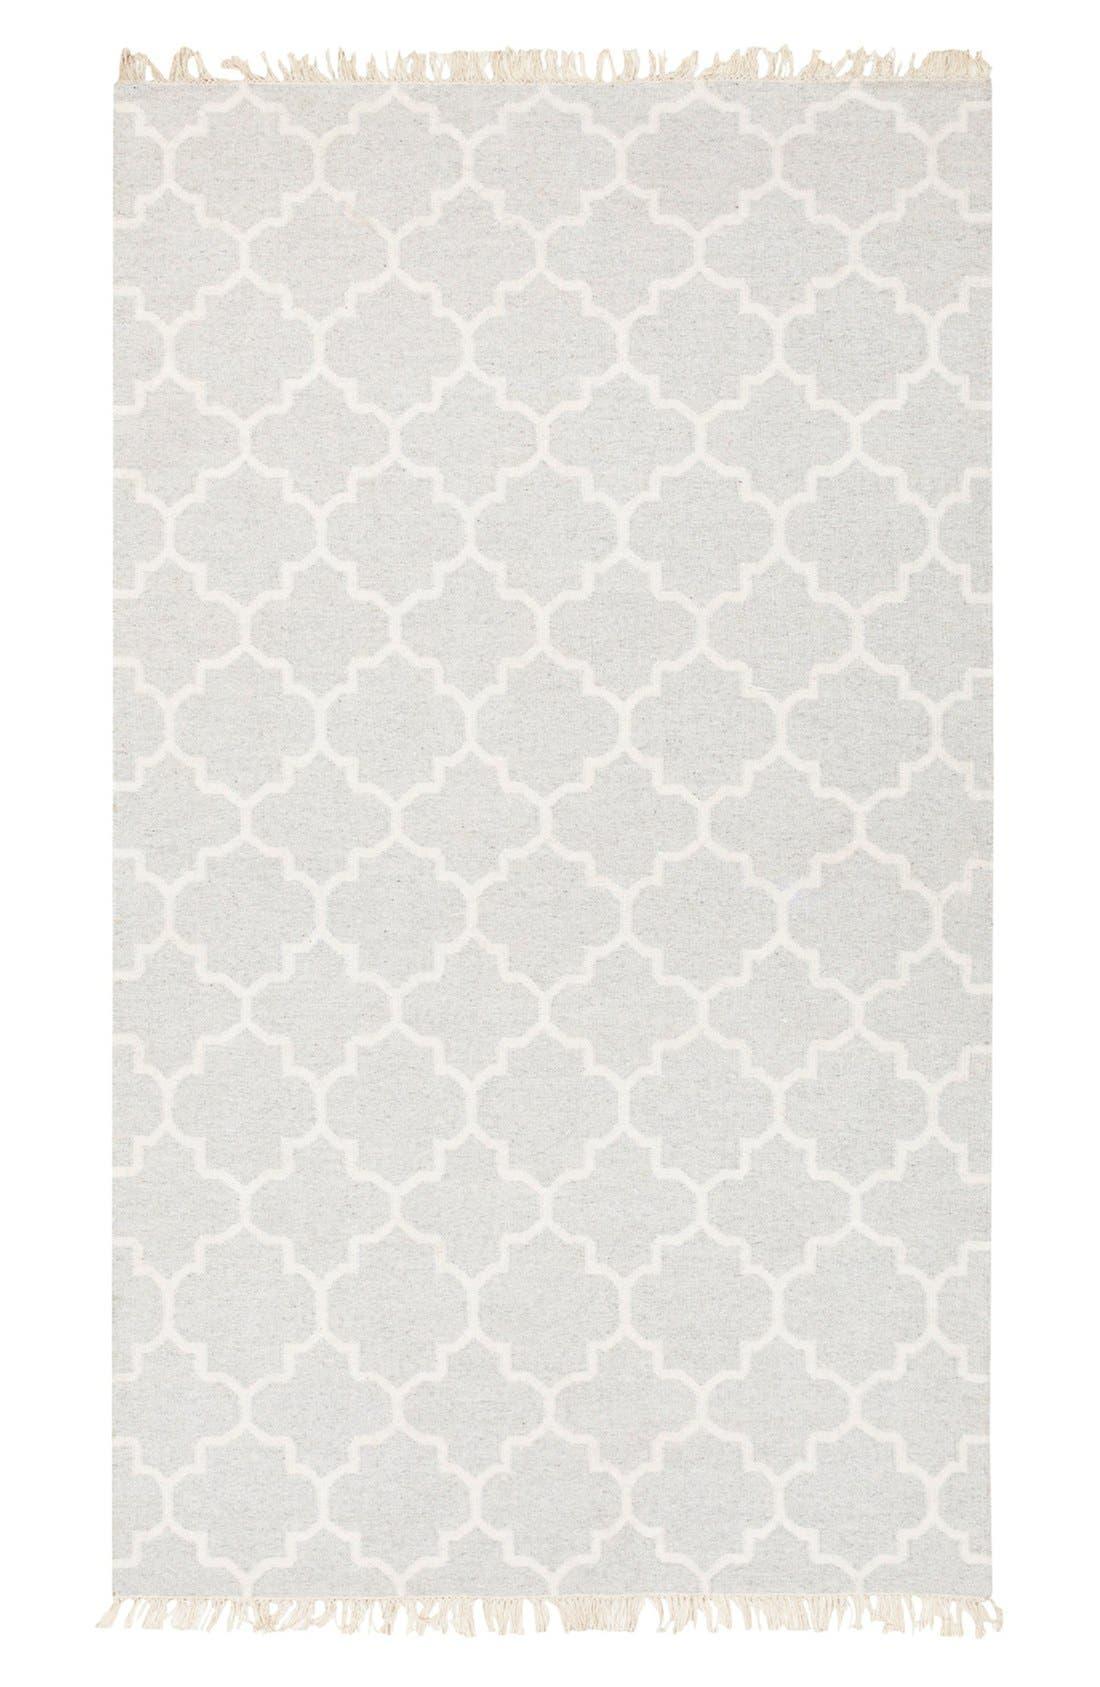 'Isle' Wool Blend Rug,                         Main,                         color, Light Grey